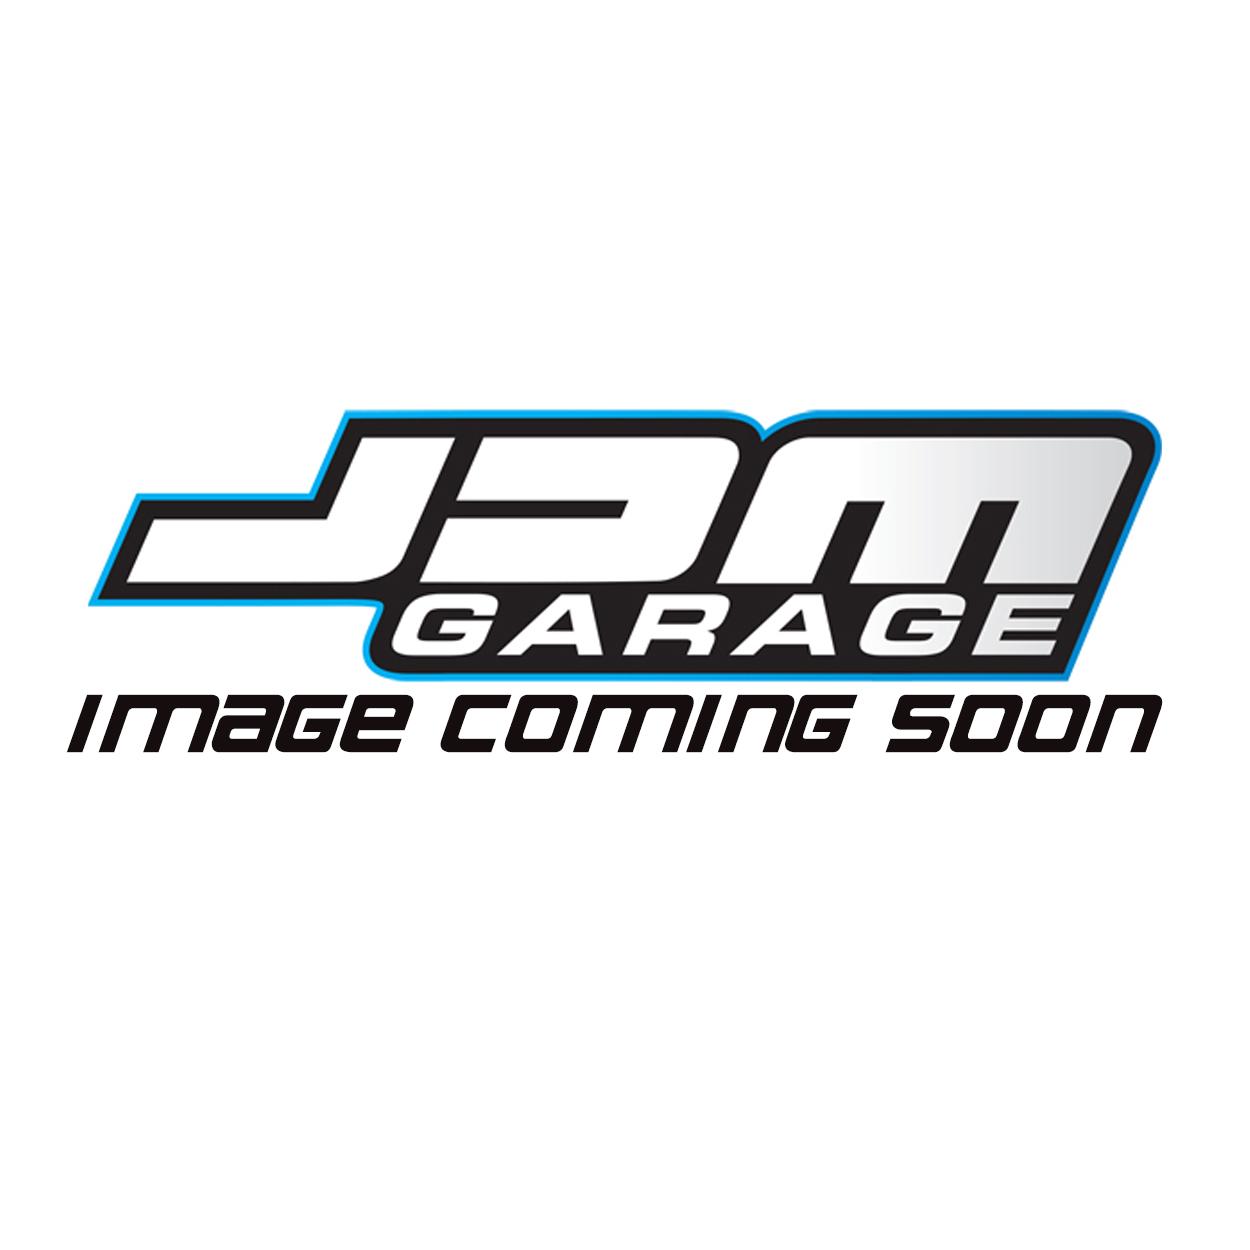 OE Replacement & EBC Greenstuff / Yellowstuff Front Brake Pads - Mazda MX5 Mk3 NC 05-15